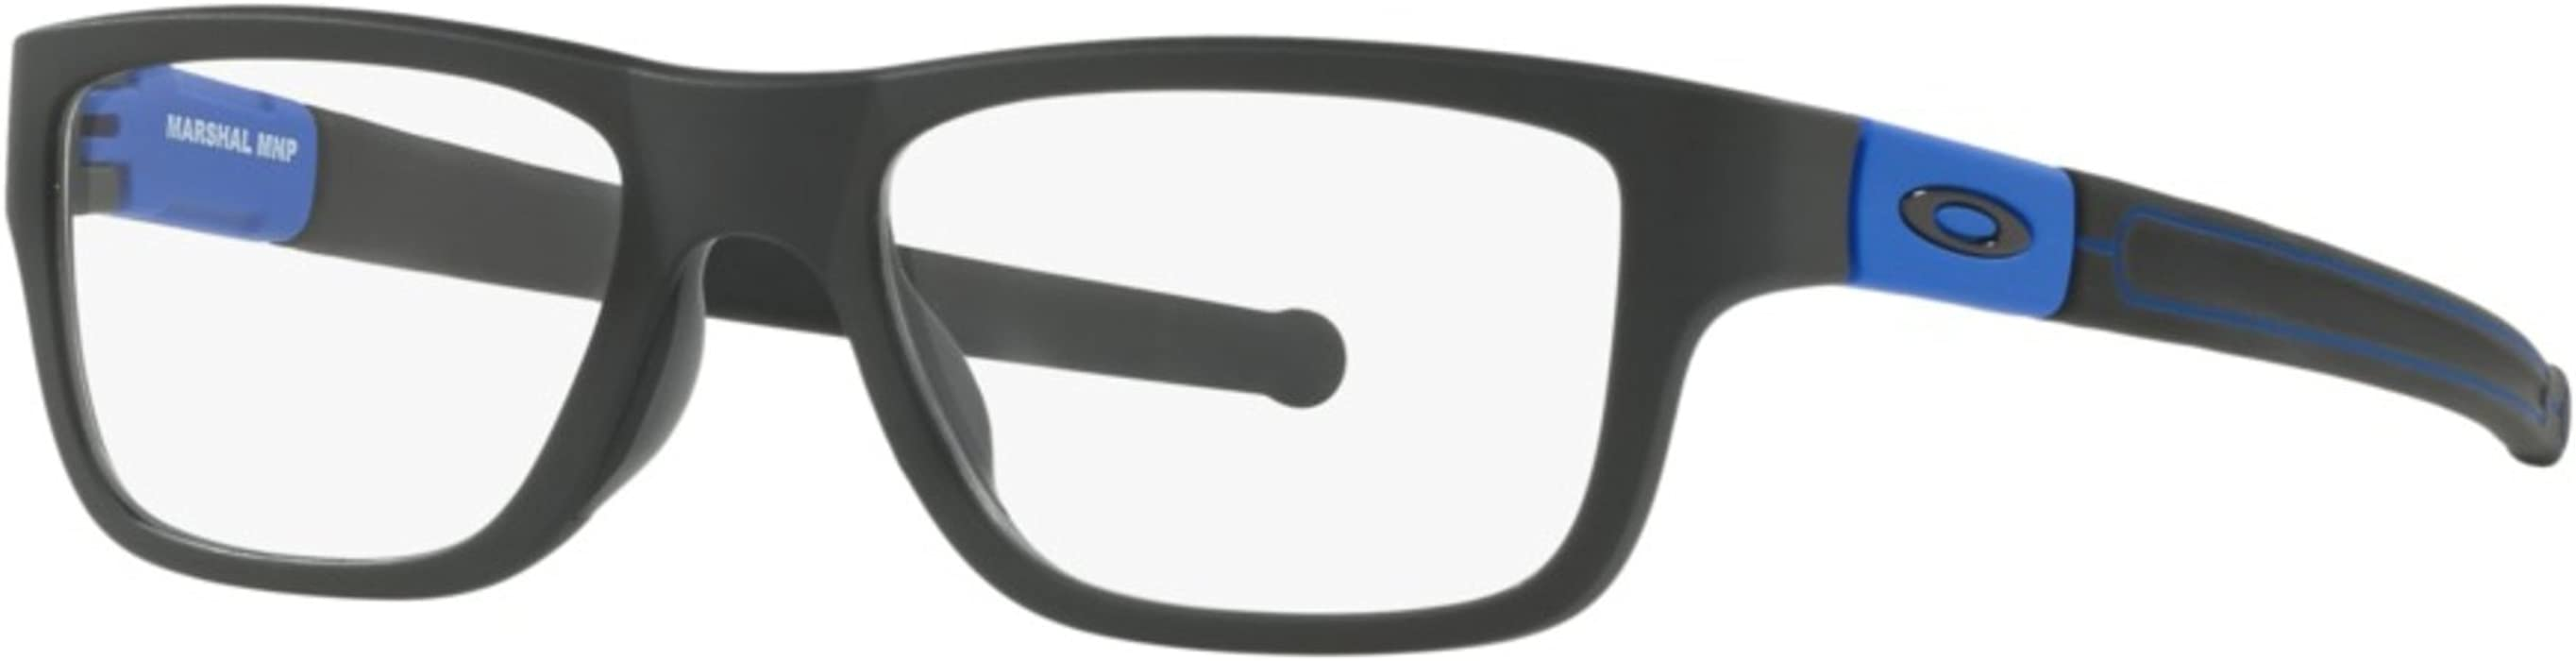 ca64063e9a Oakley MARSHAL COBALT COLLECTION OX8091-05 Eyeglasses Satin Black 51mm